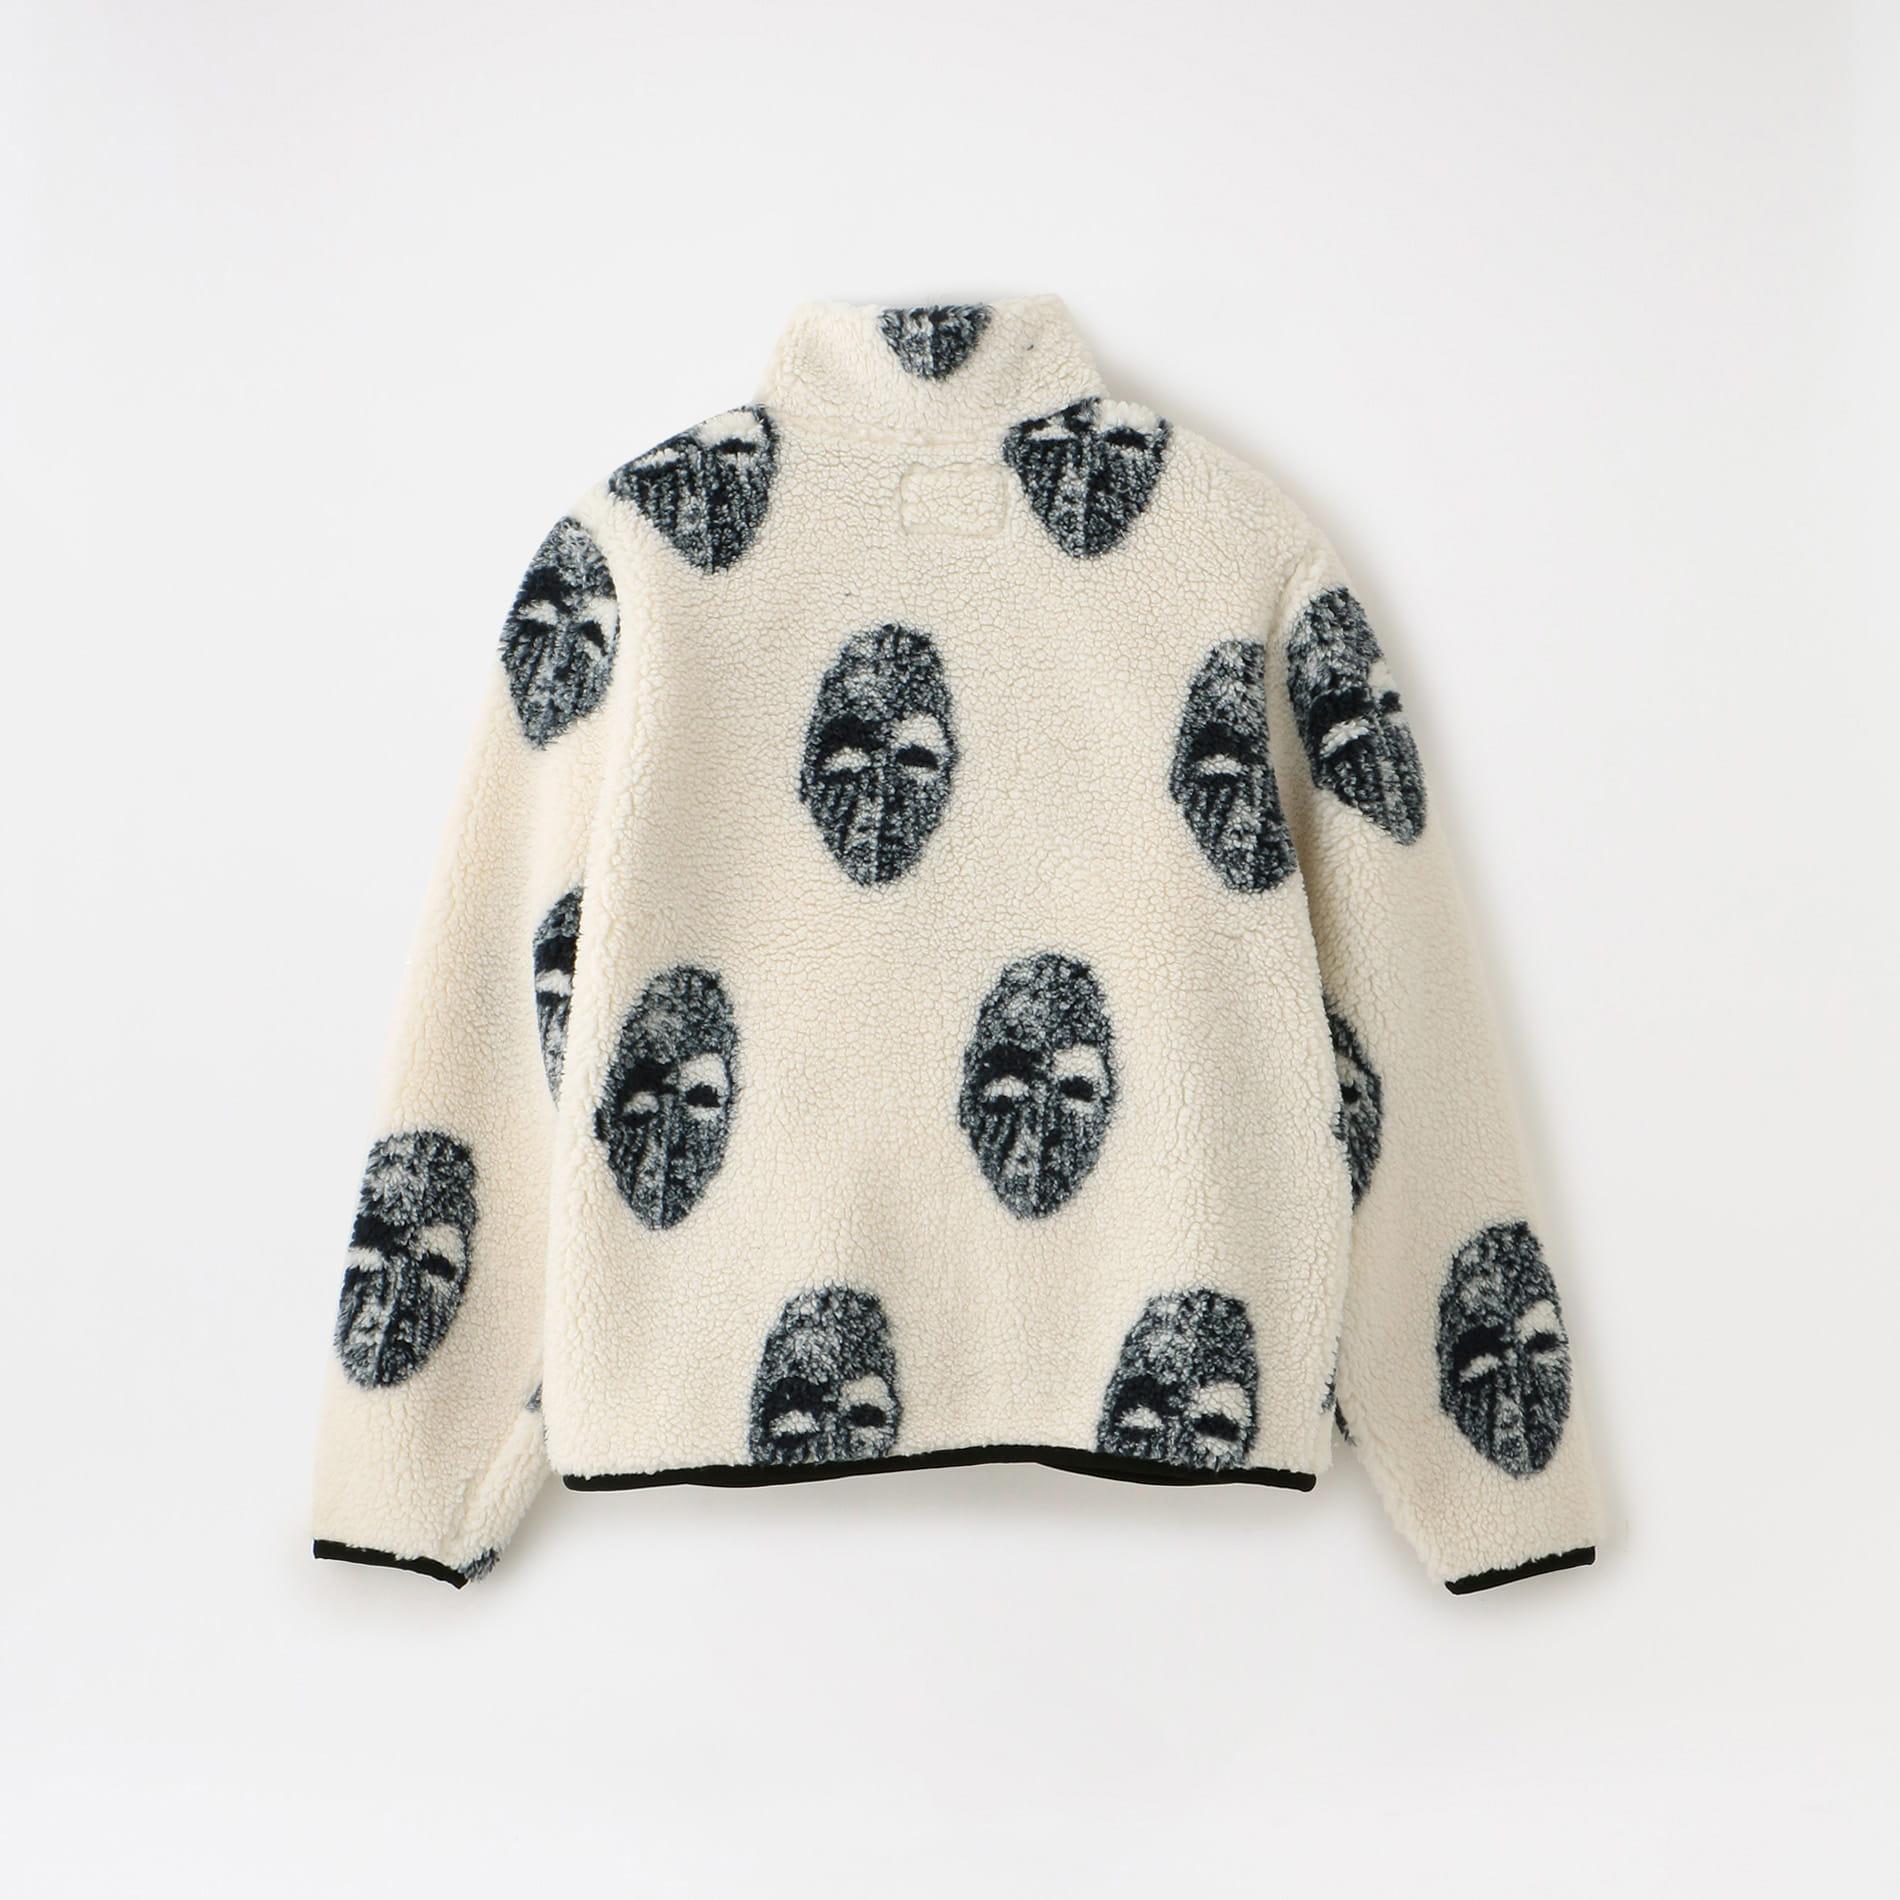 【Stussy】MEN Mask Jacquard Sherpa 118389